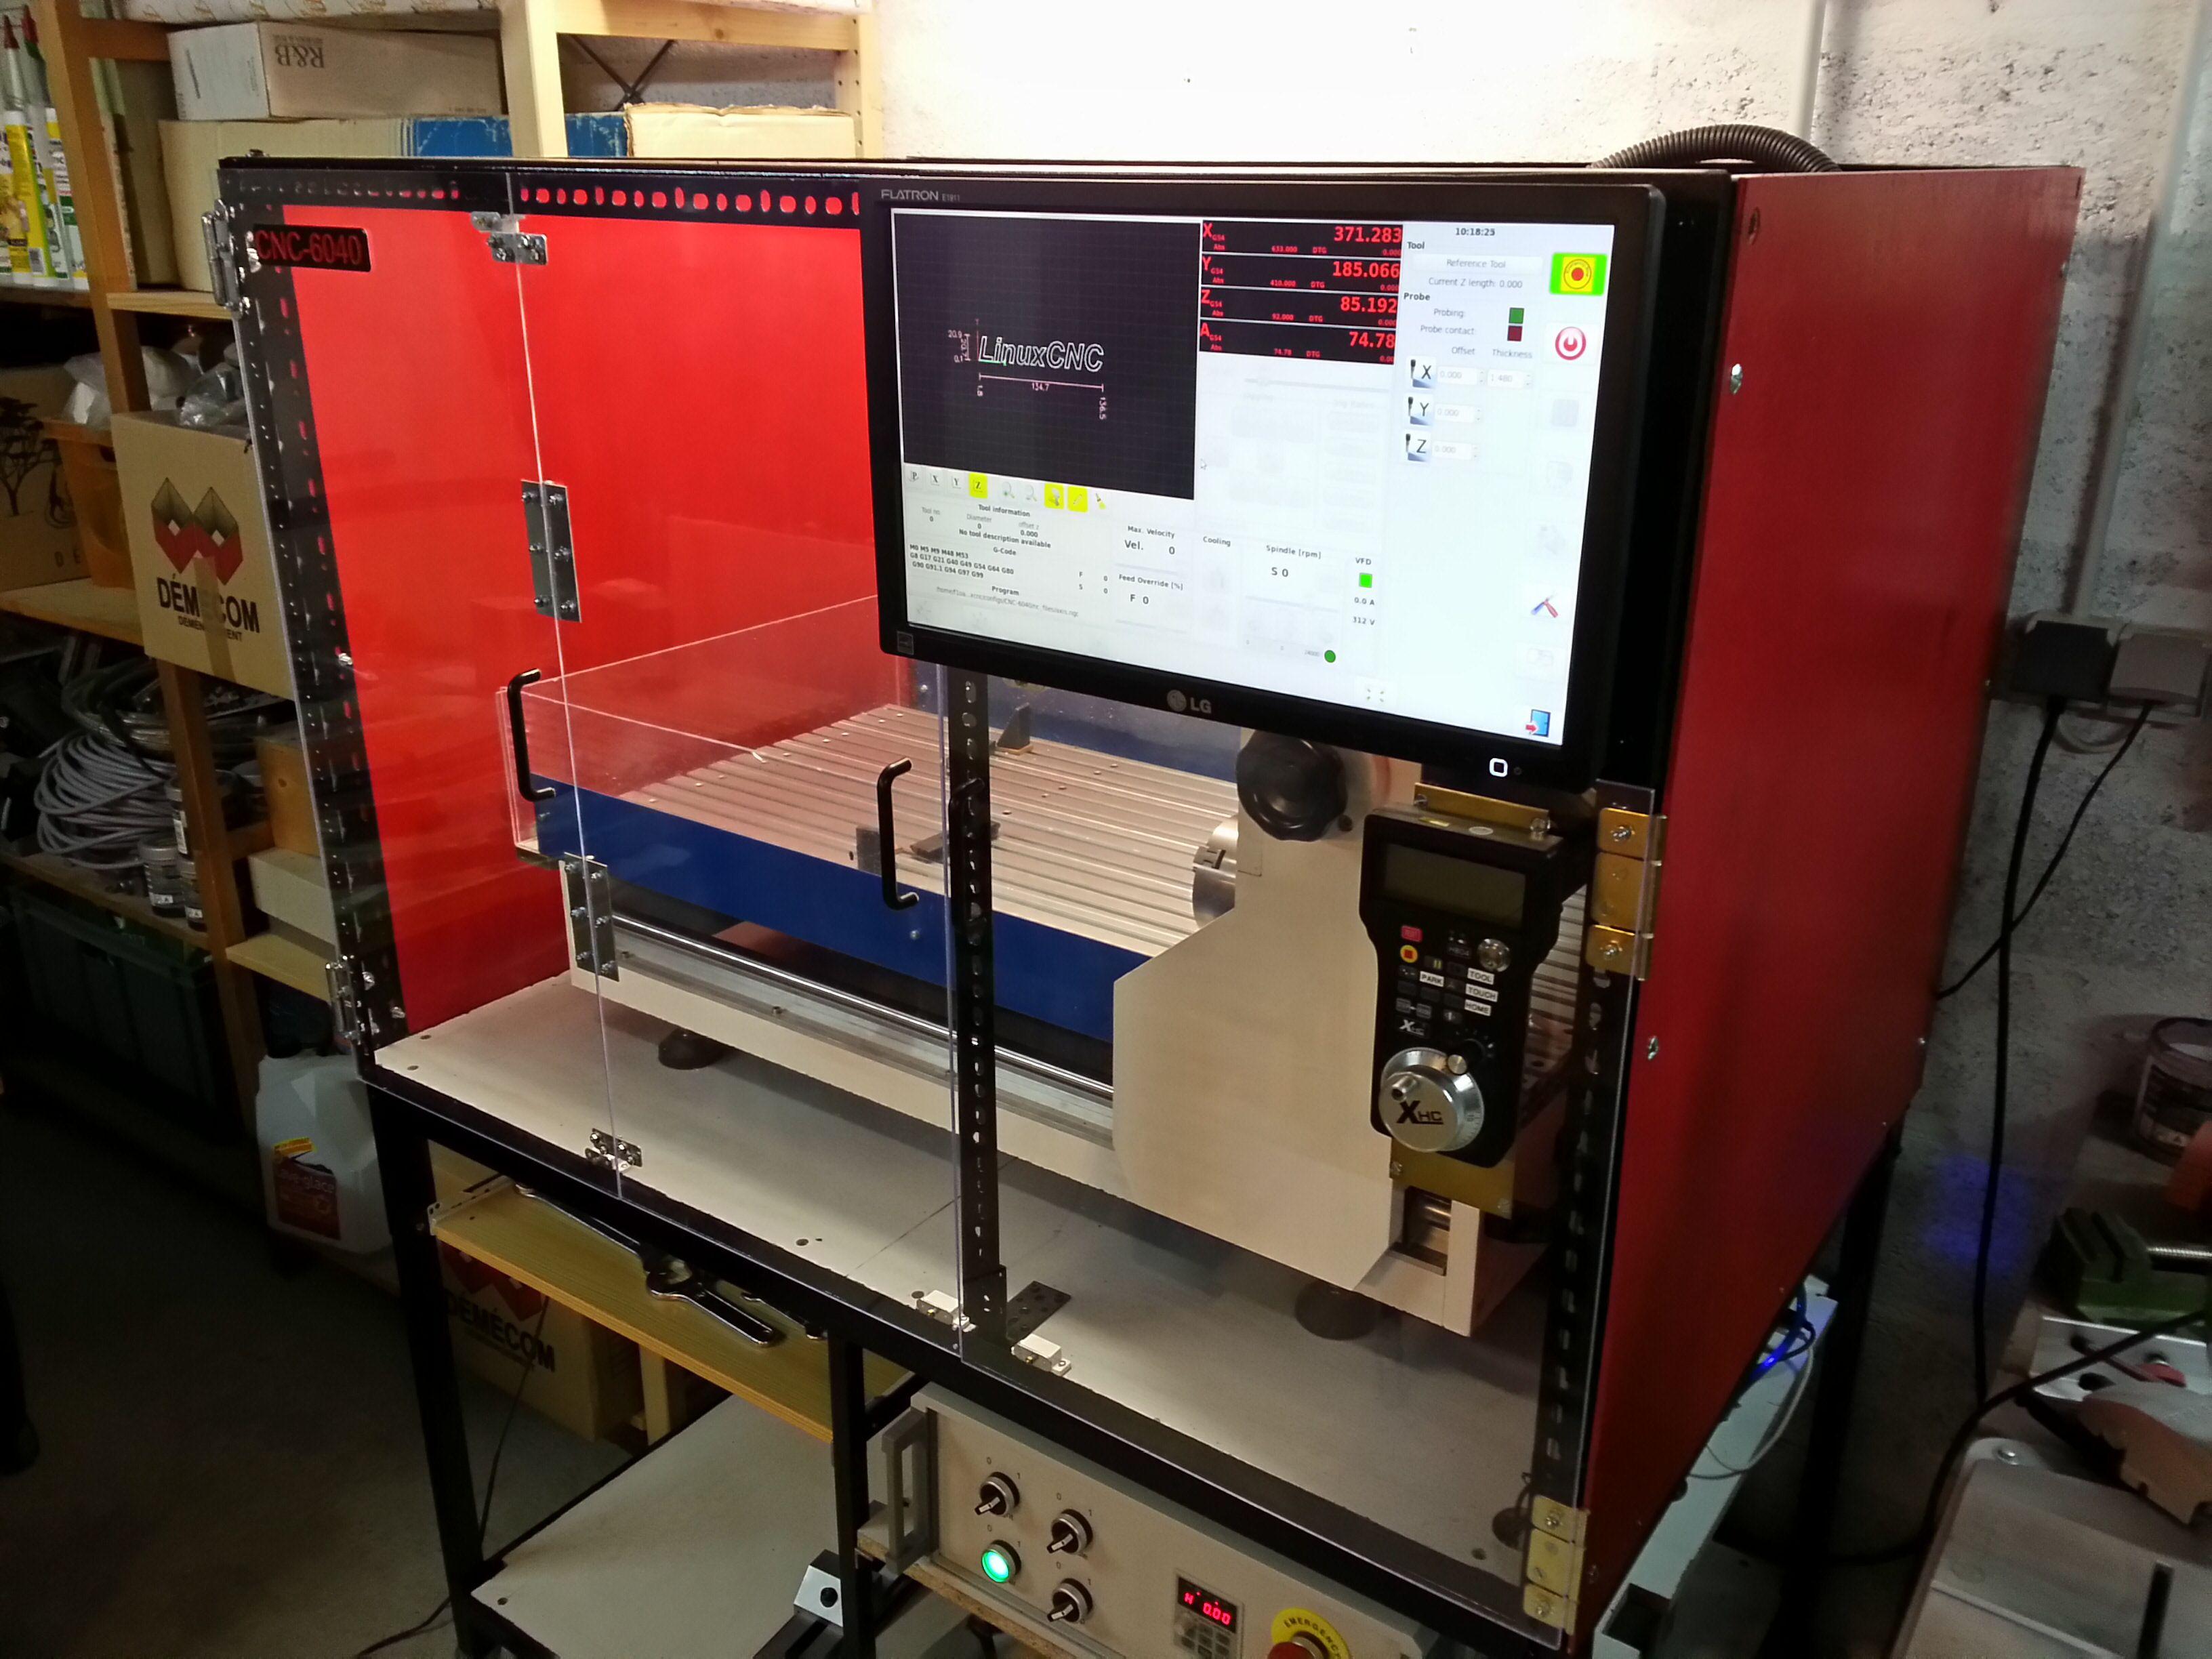 Cnc enclosure | CNC | Pinterest | CNC and Hardware